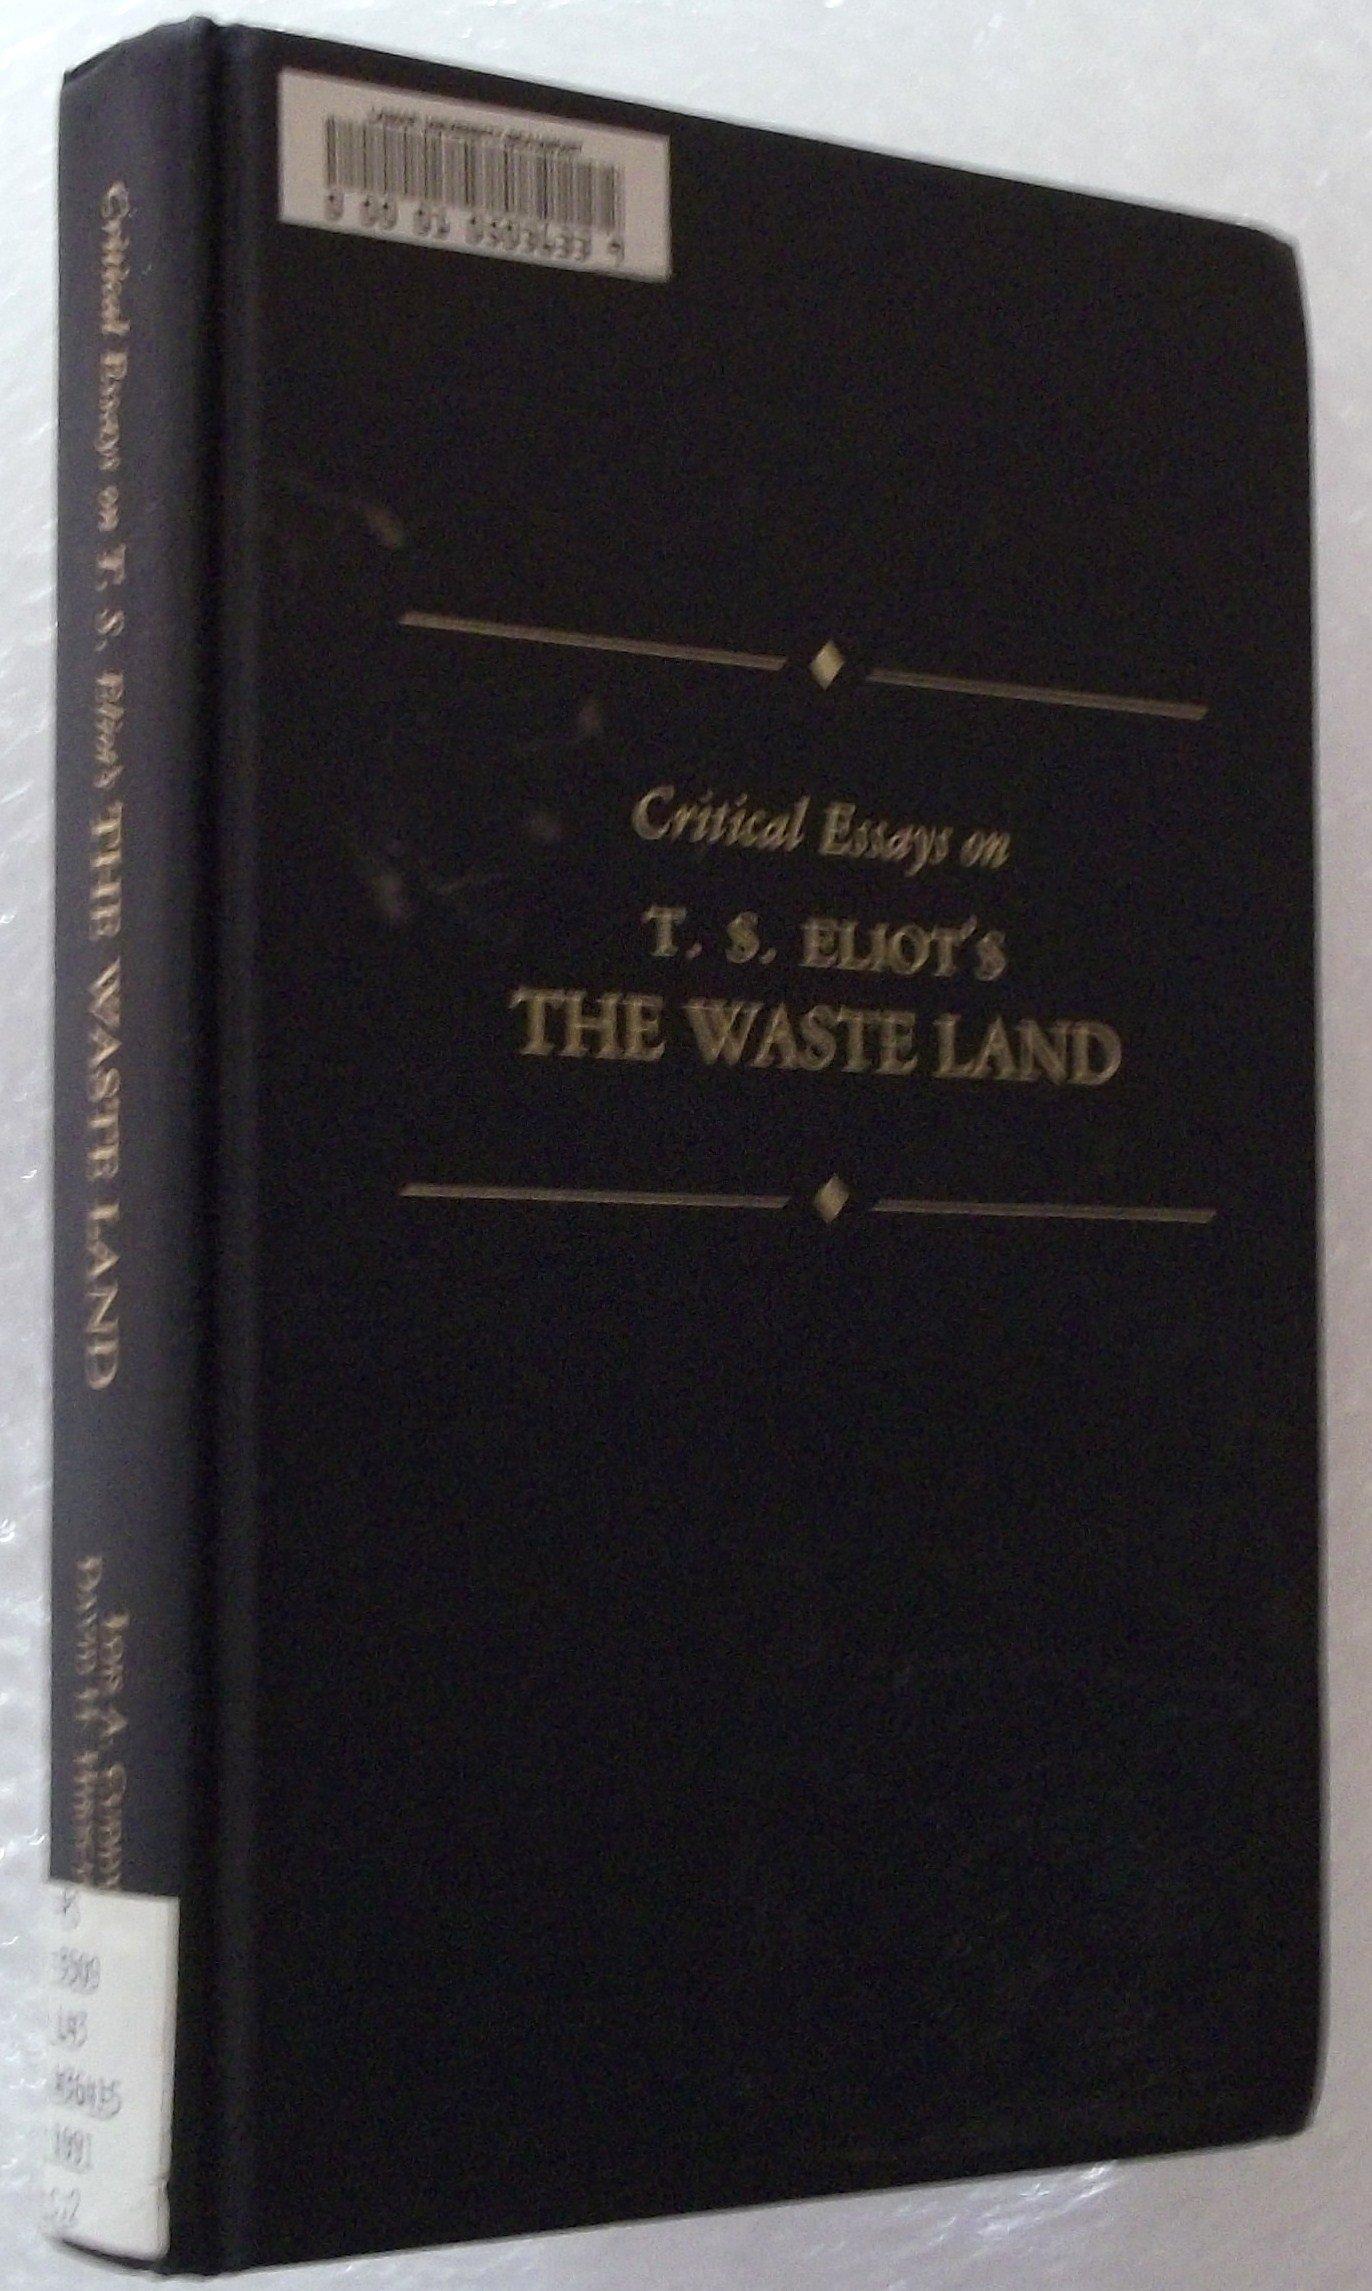 essays on the waste land